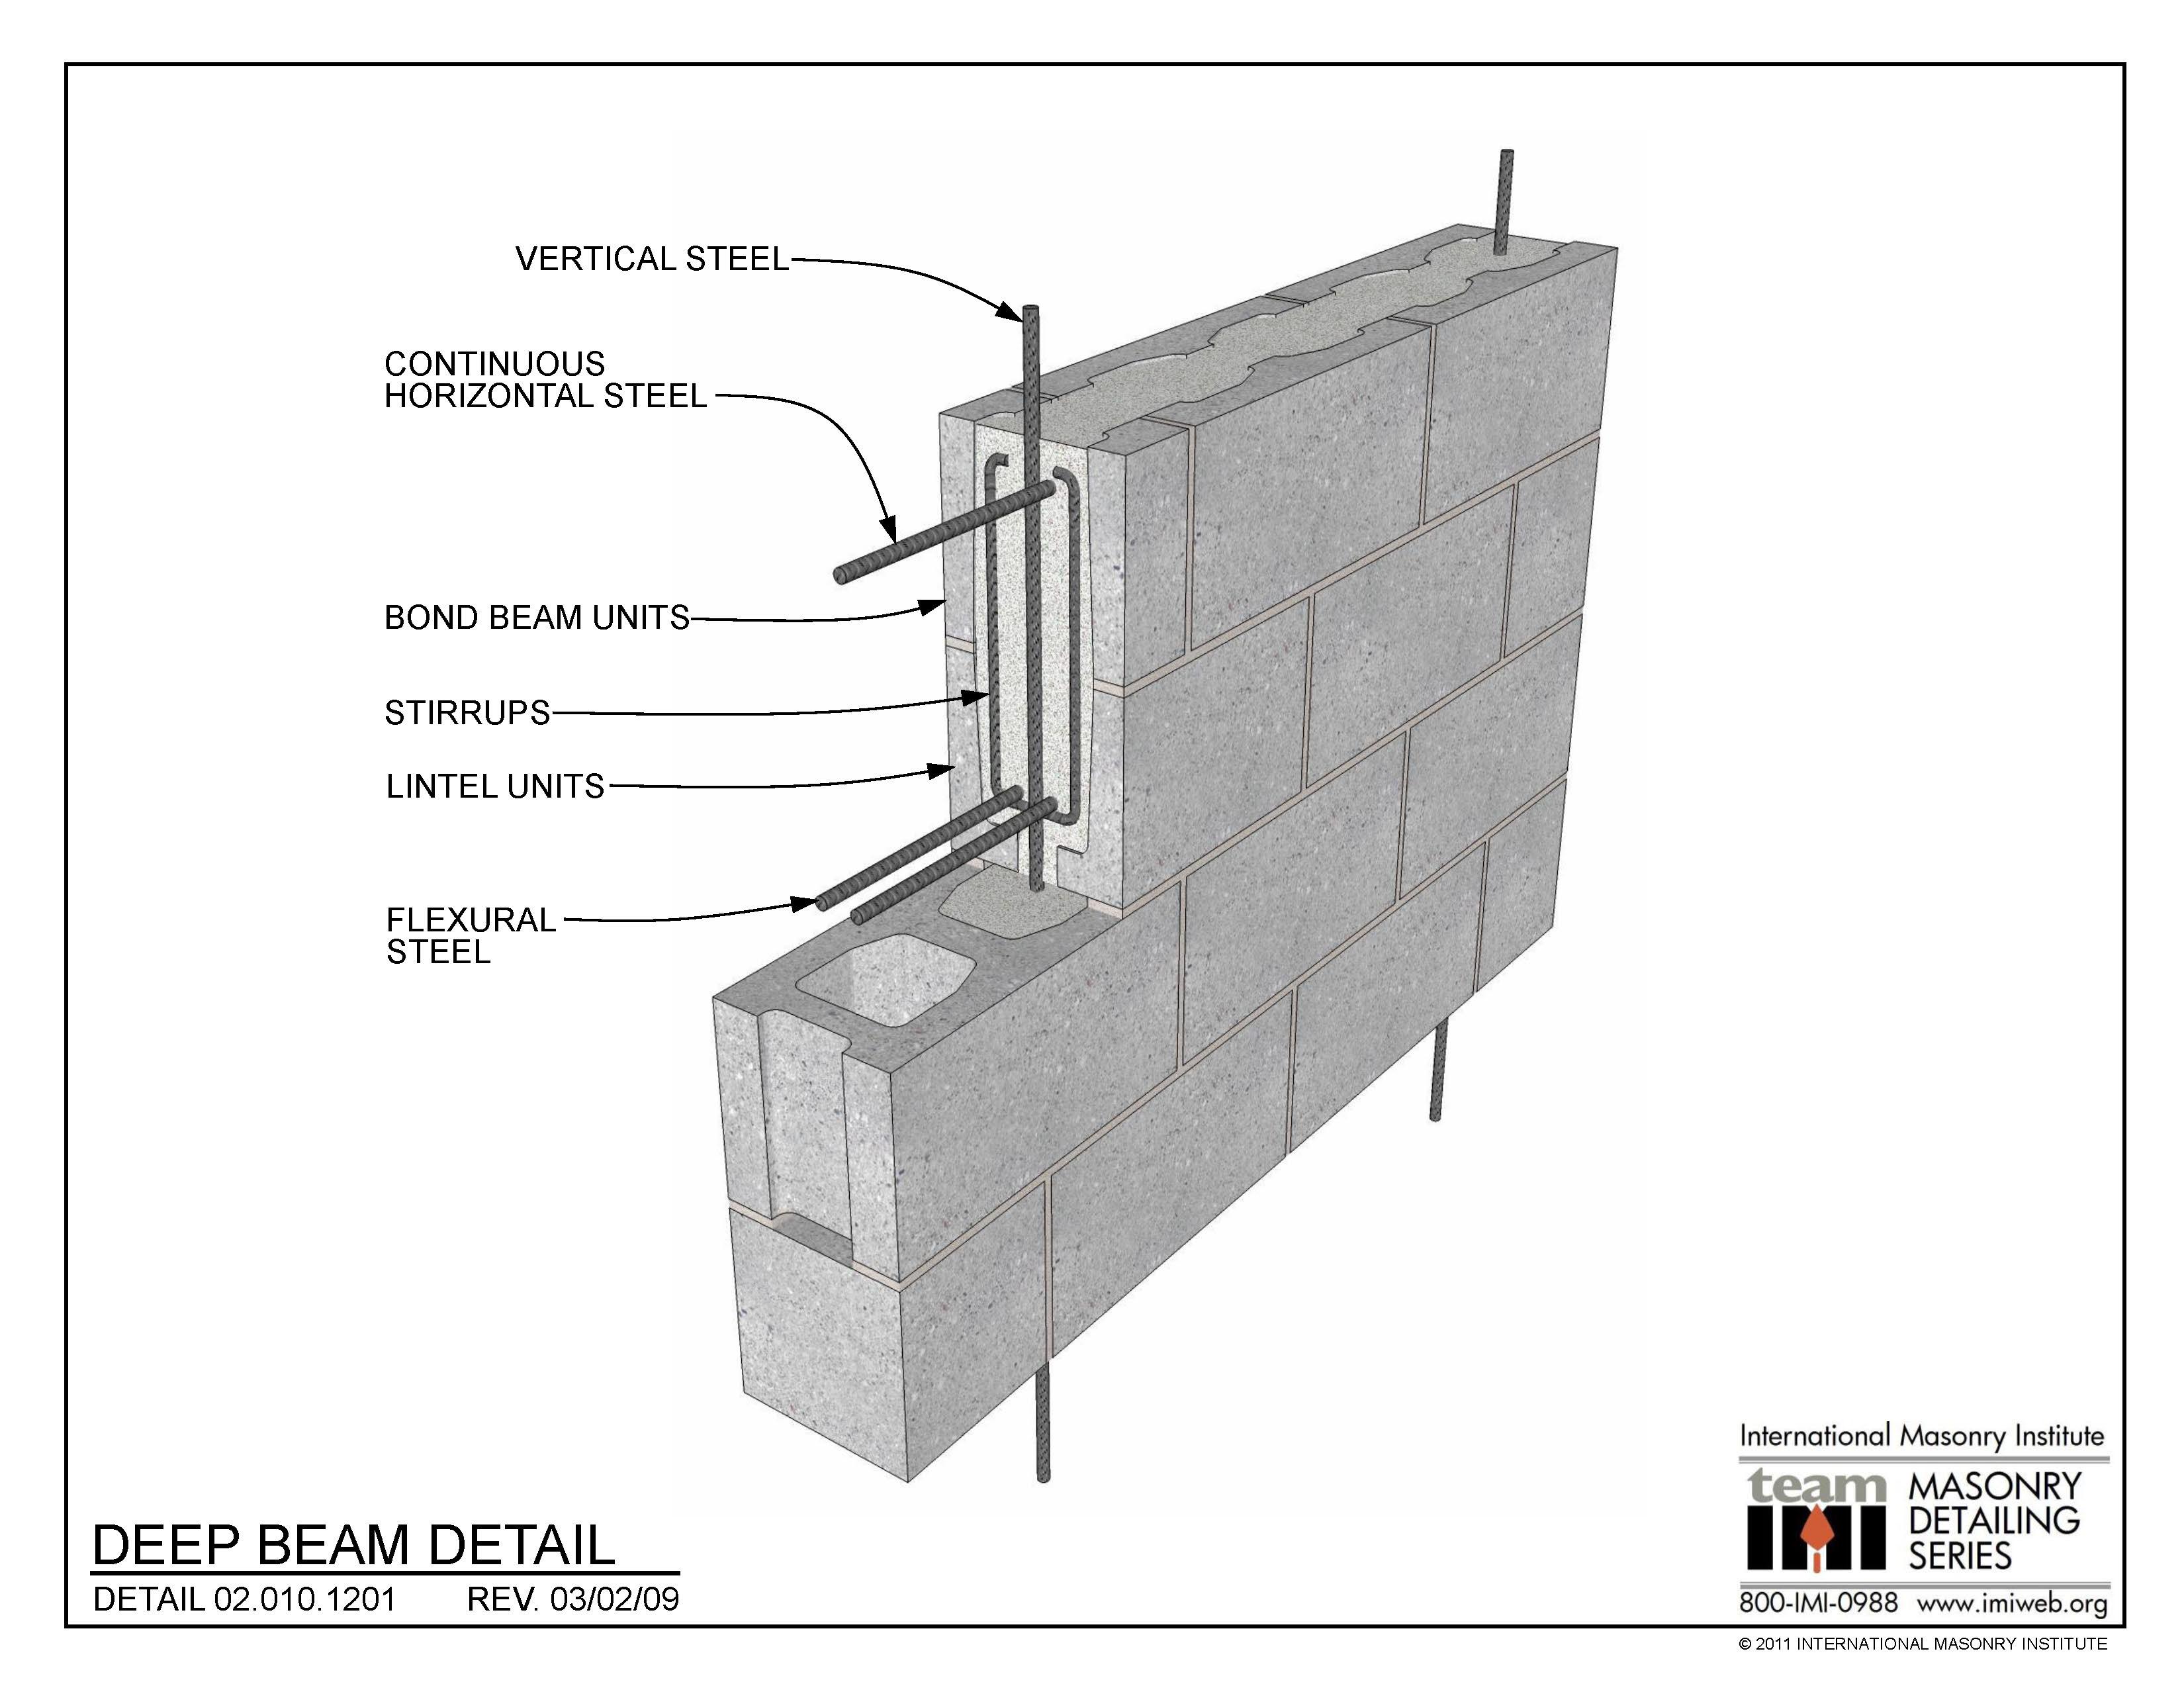 020101201 deep beam detail international masonry institute 020101201 ccuart Gallery